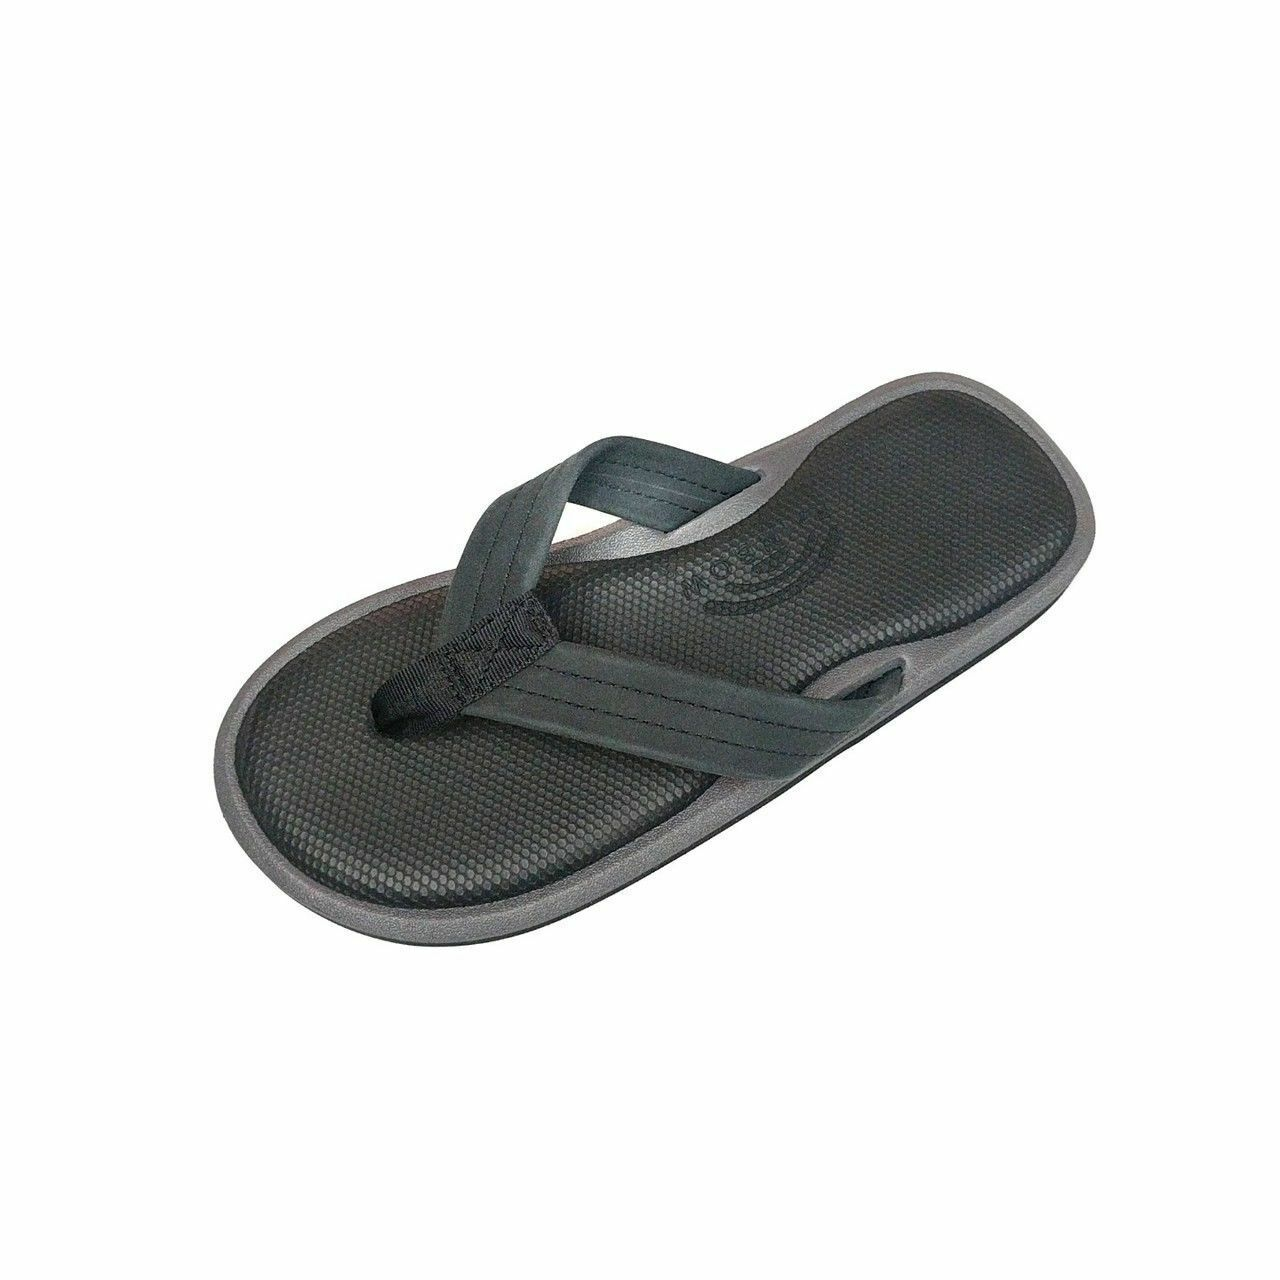 92928629028e Men Rainbow The Islander Sandal Rubber Black gray 7